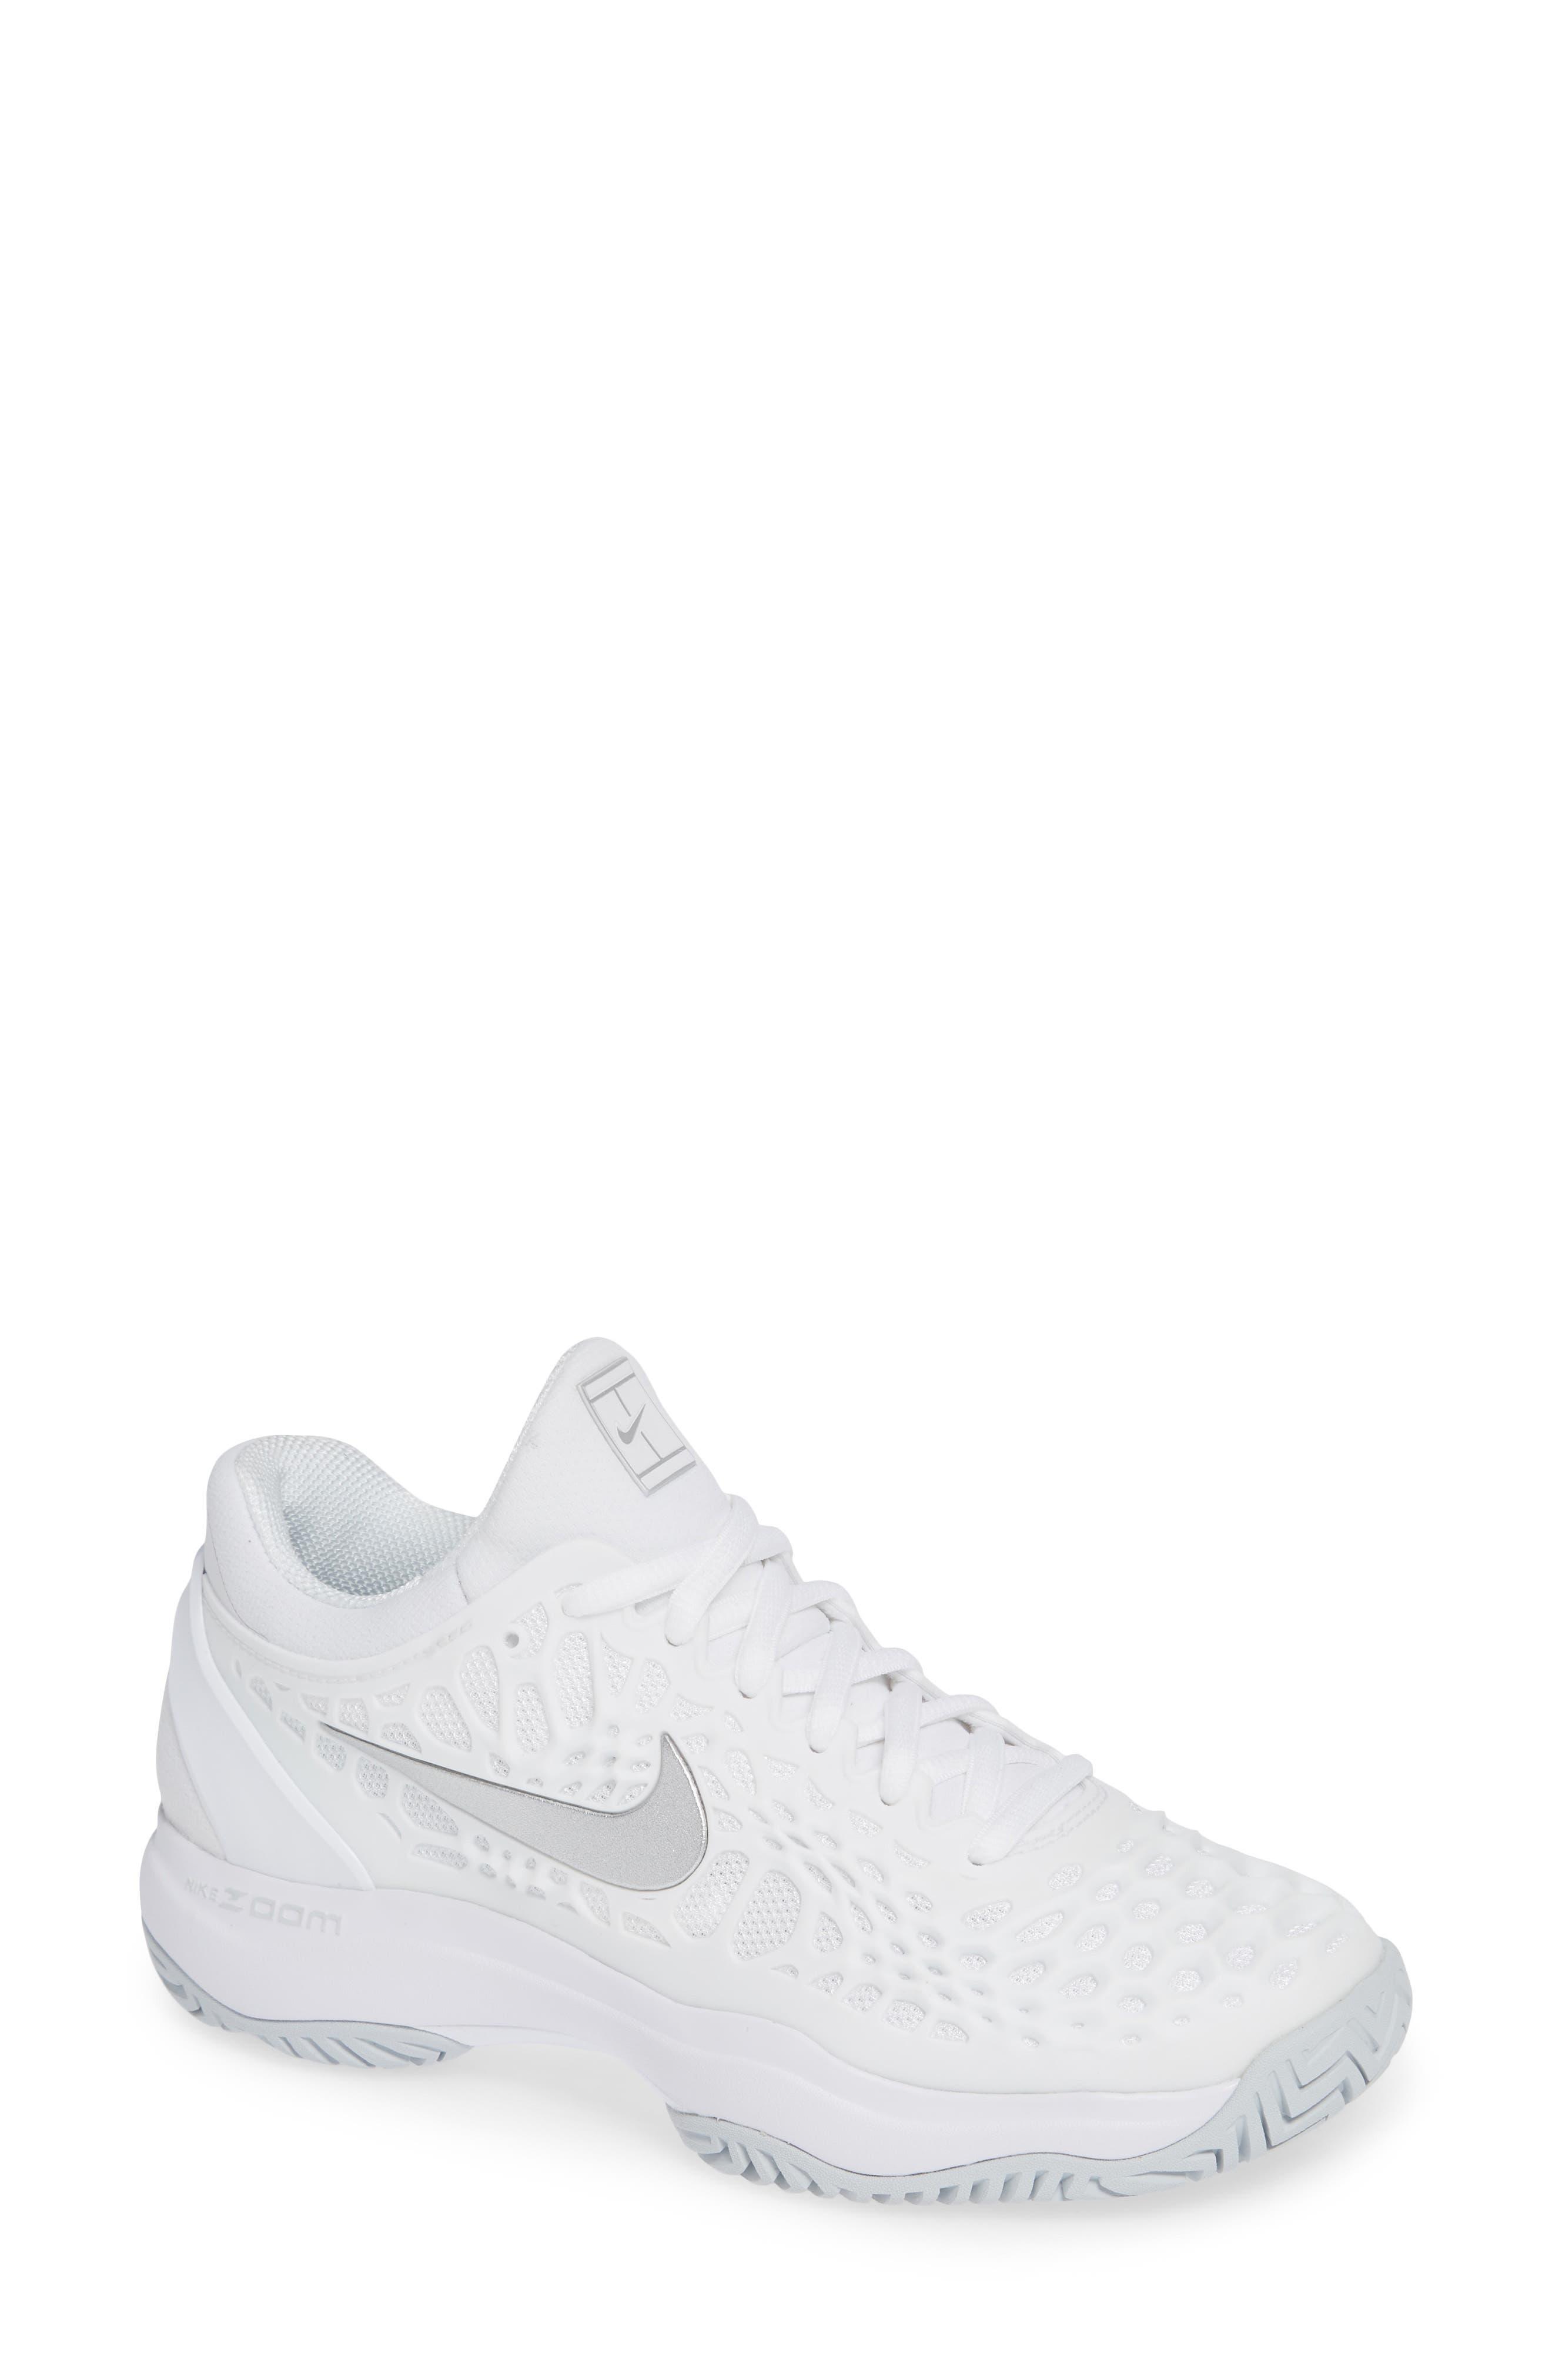 Air Zoom Cage 3 HC Tennis Shoe, Main, color, WHITE/ SILVER/ PLATINUM